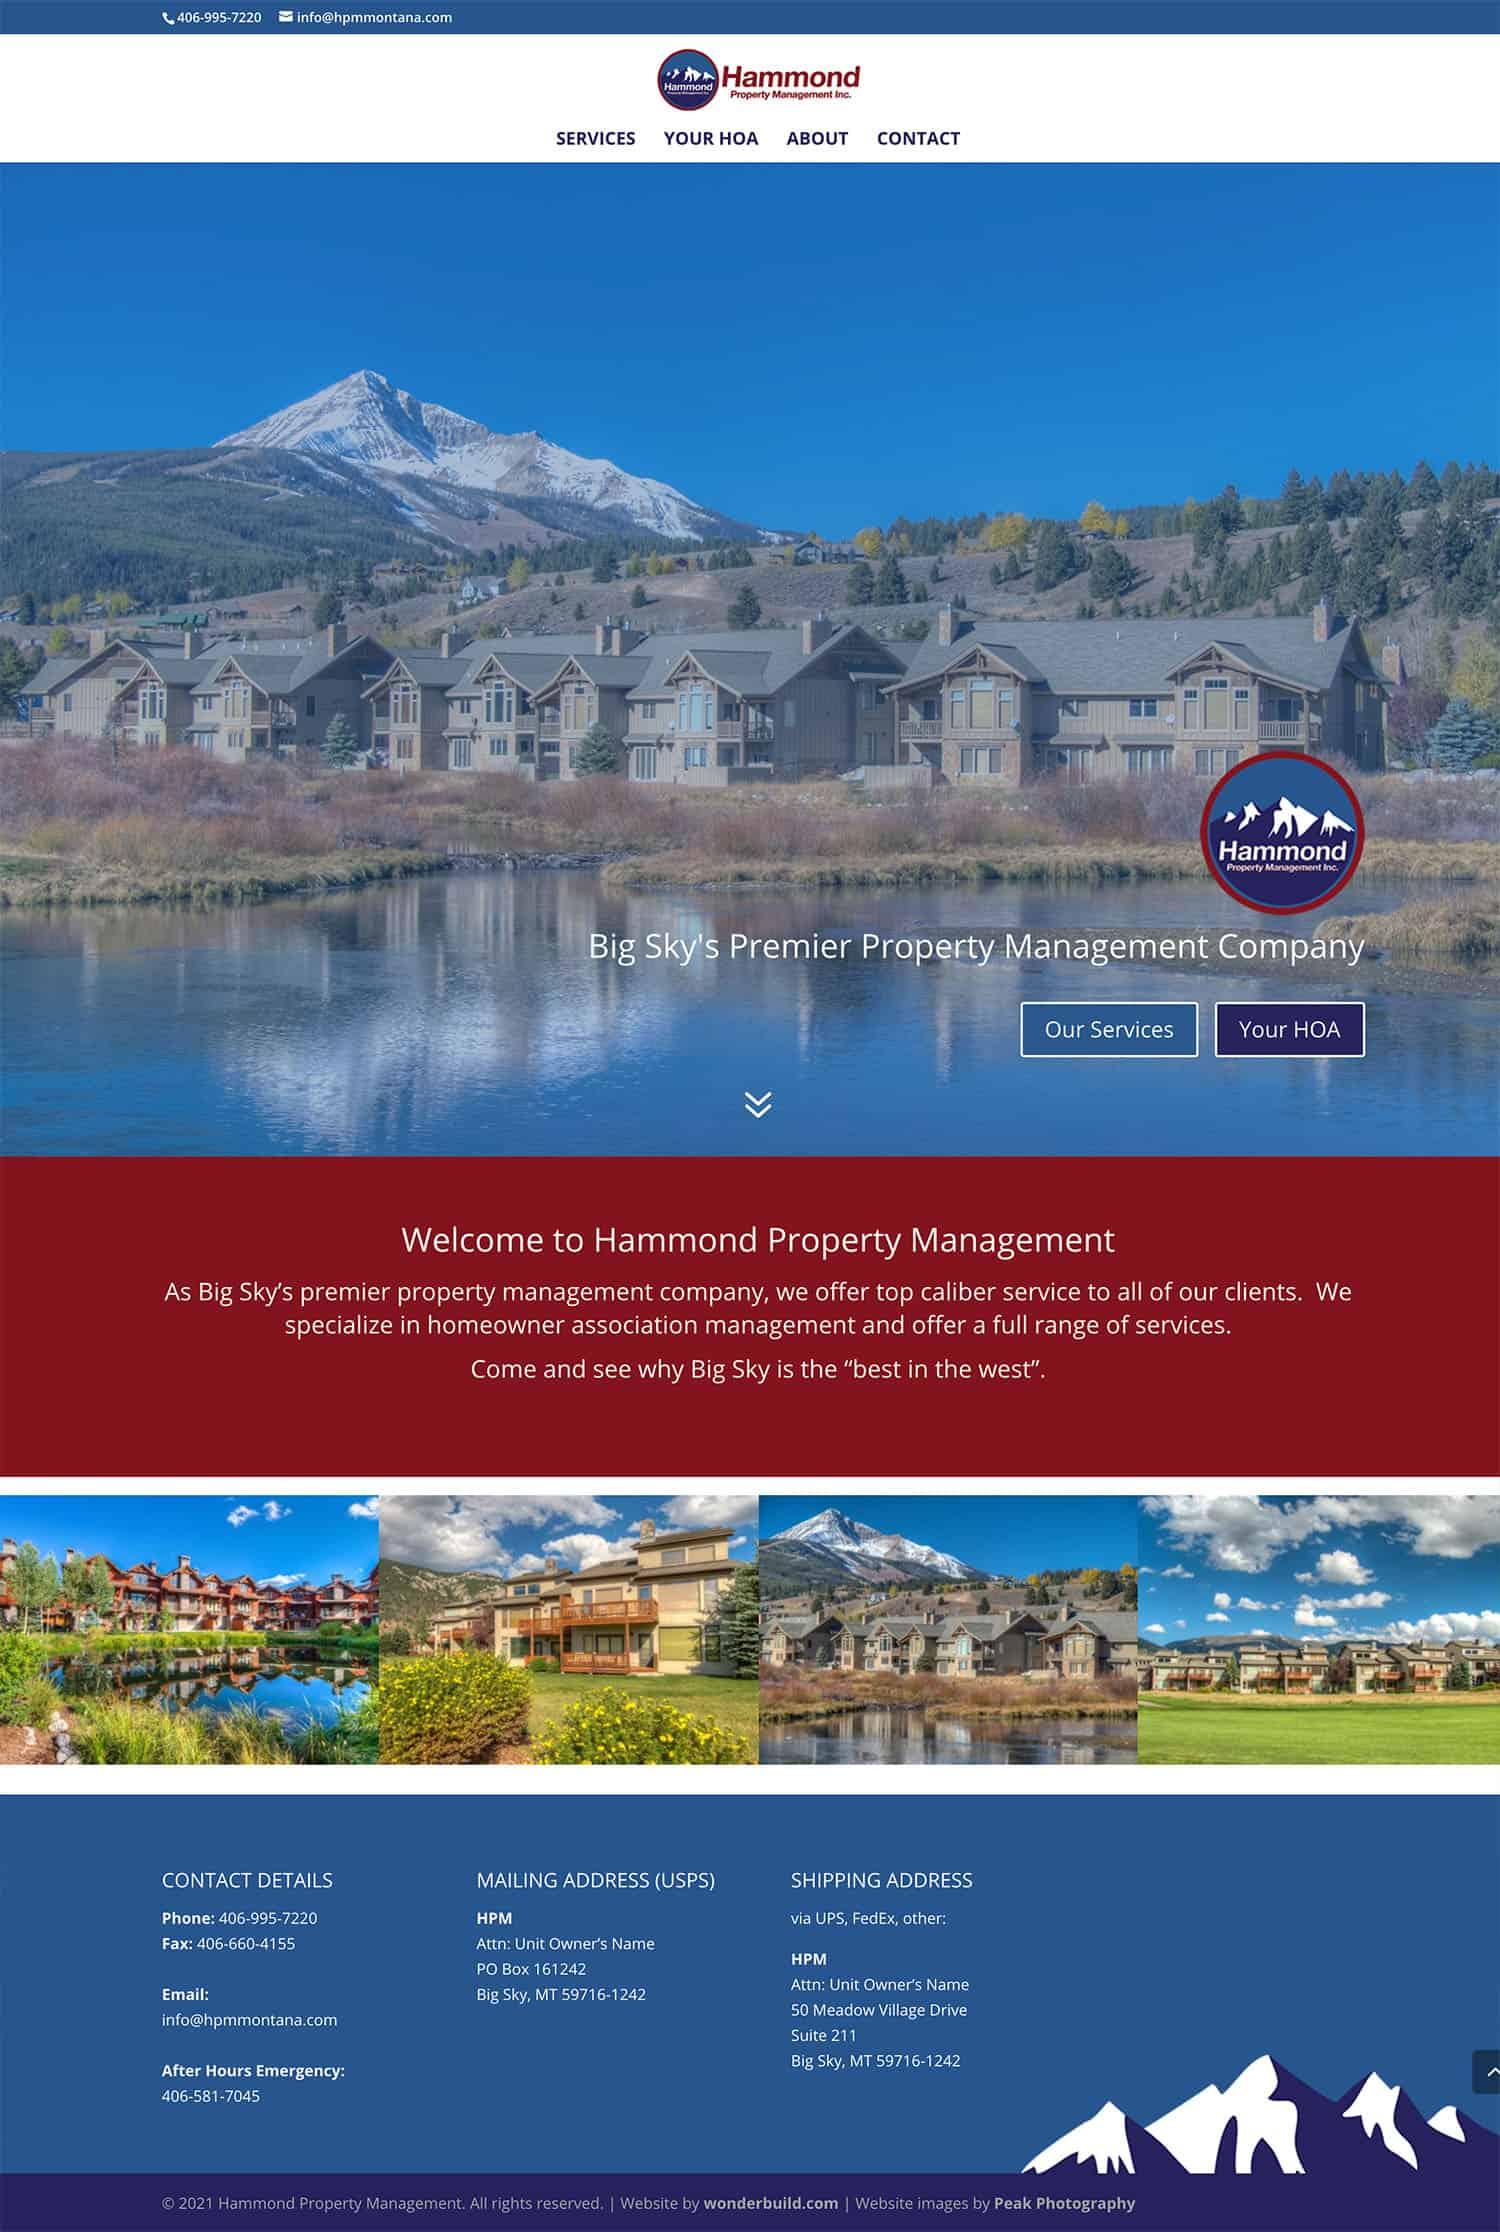 Hammond Property Management Website